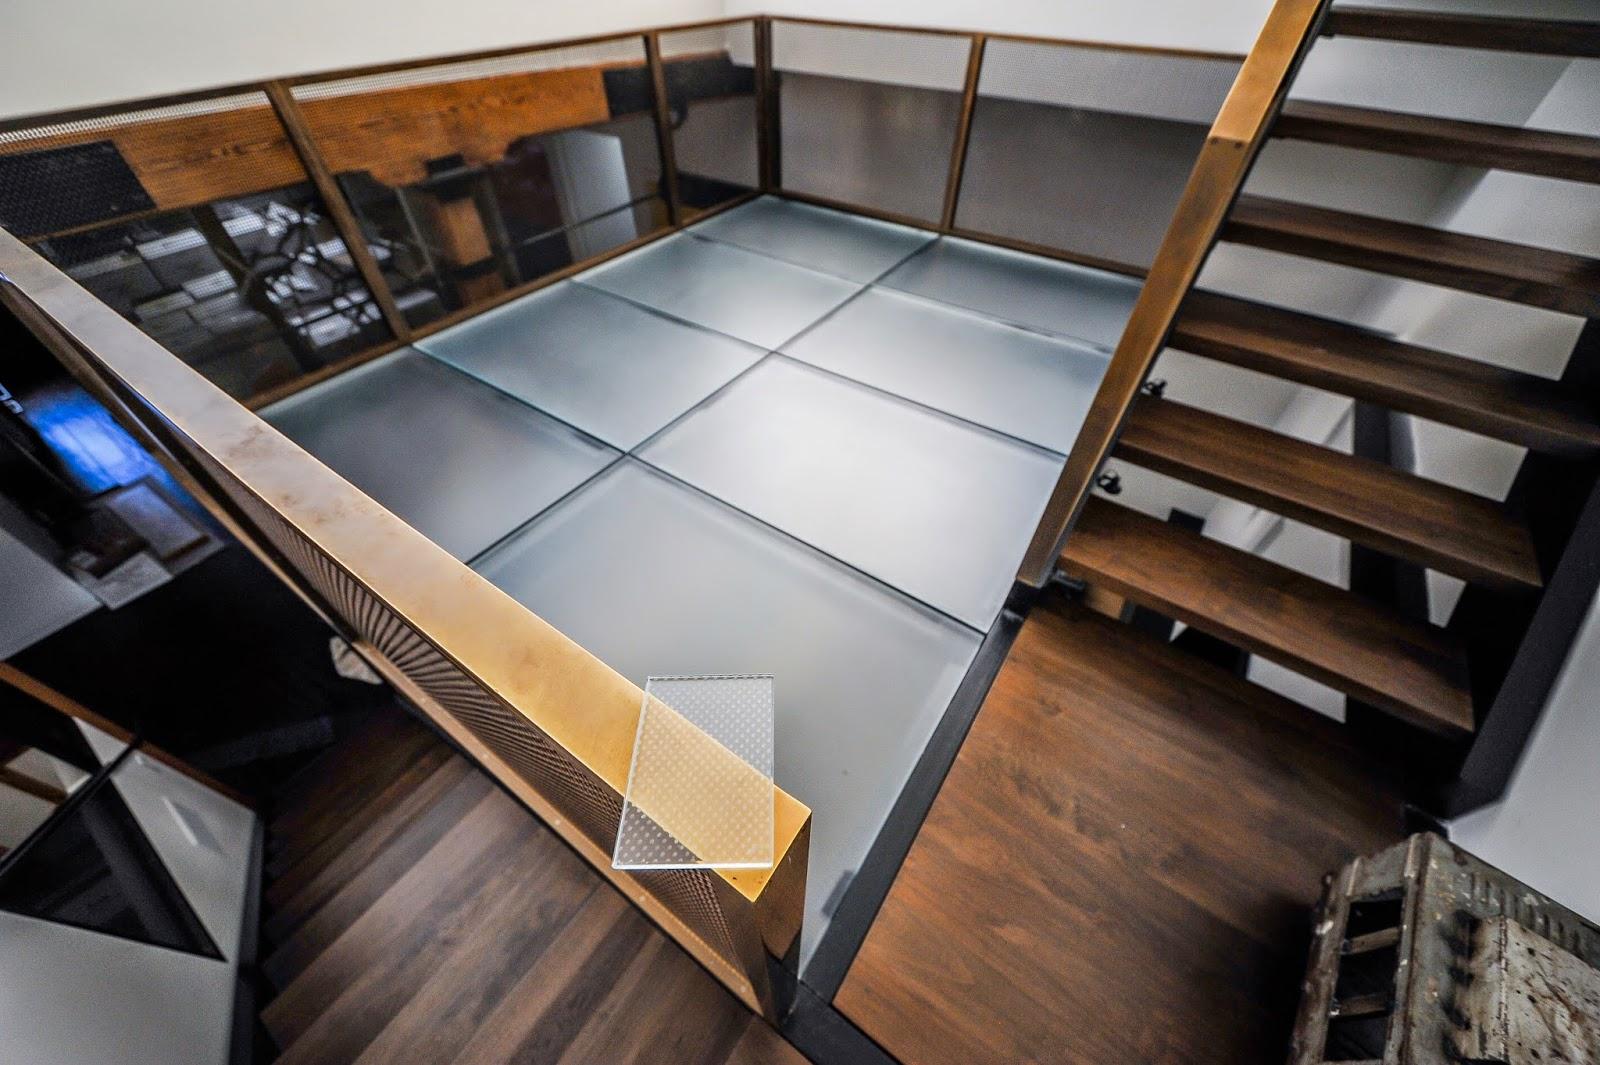 Laminated Glass Flooring Service : Laminated glass floor installation ny